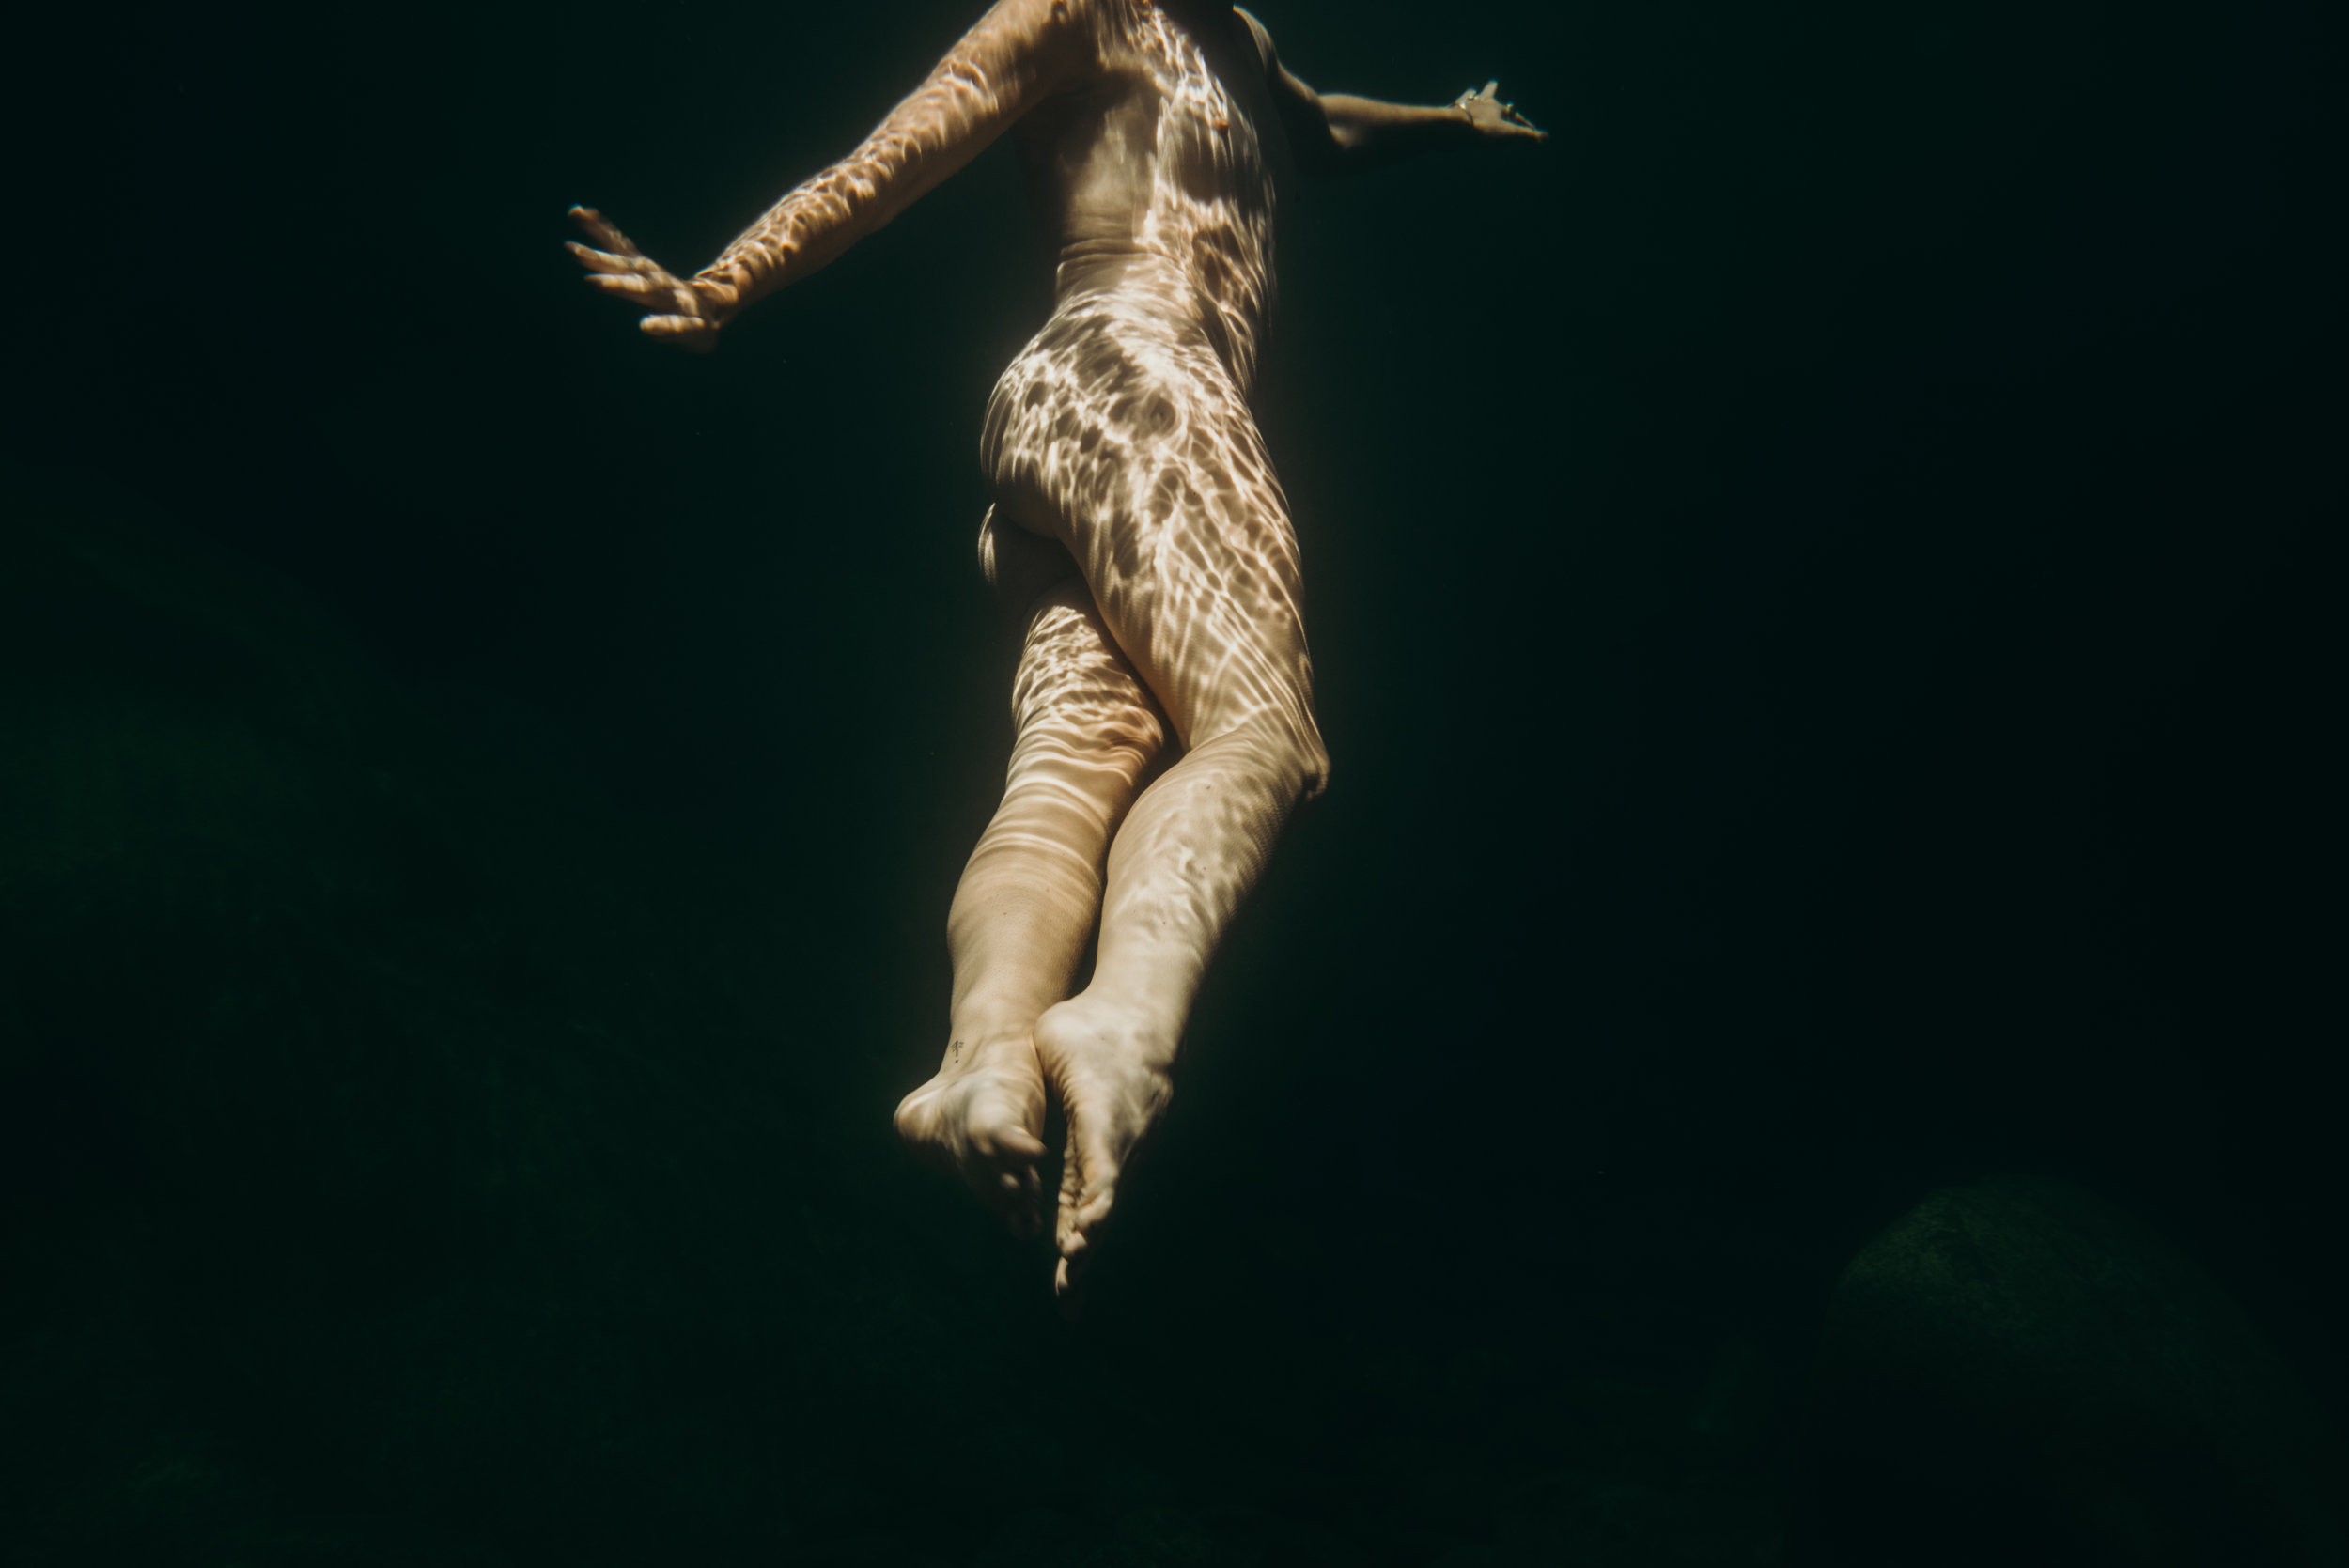 body_nude_art_fine_photography_justin_nunnink.jpg